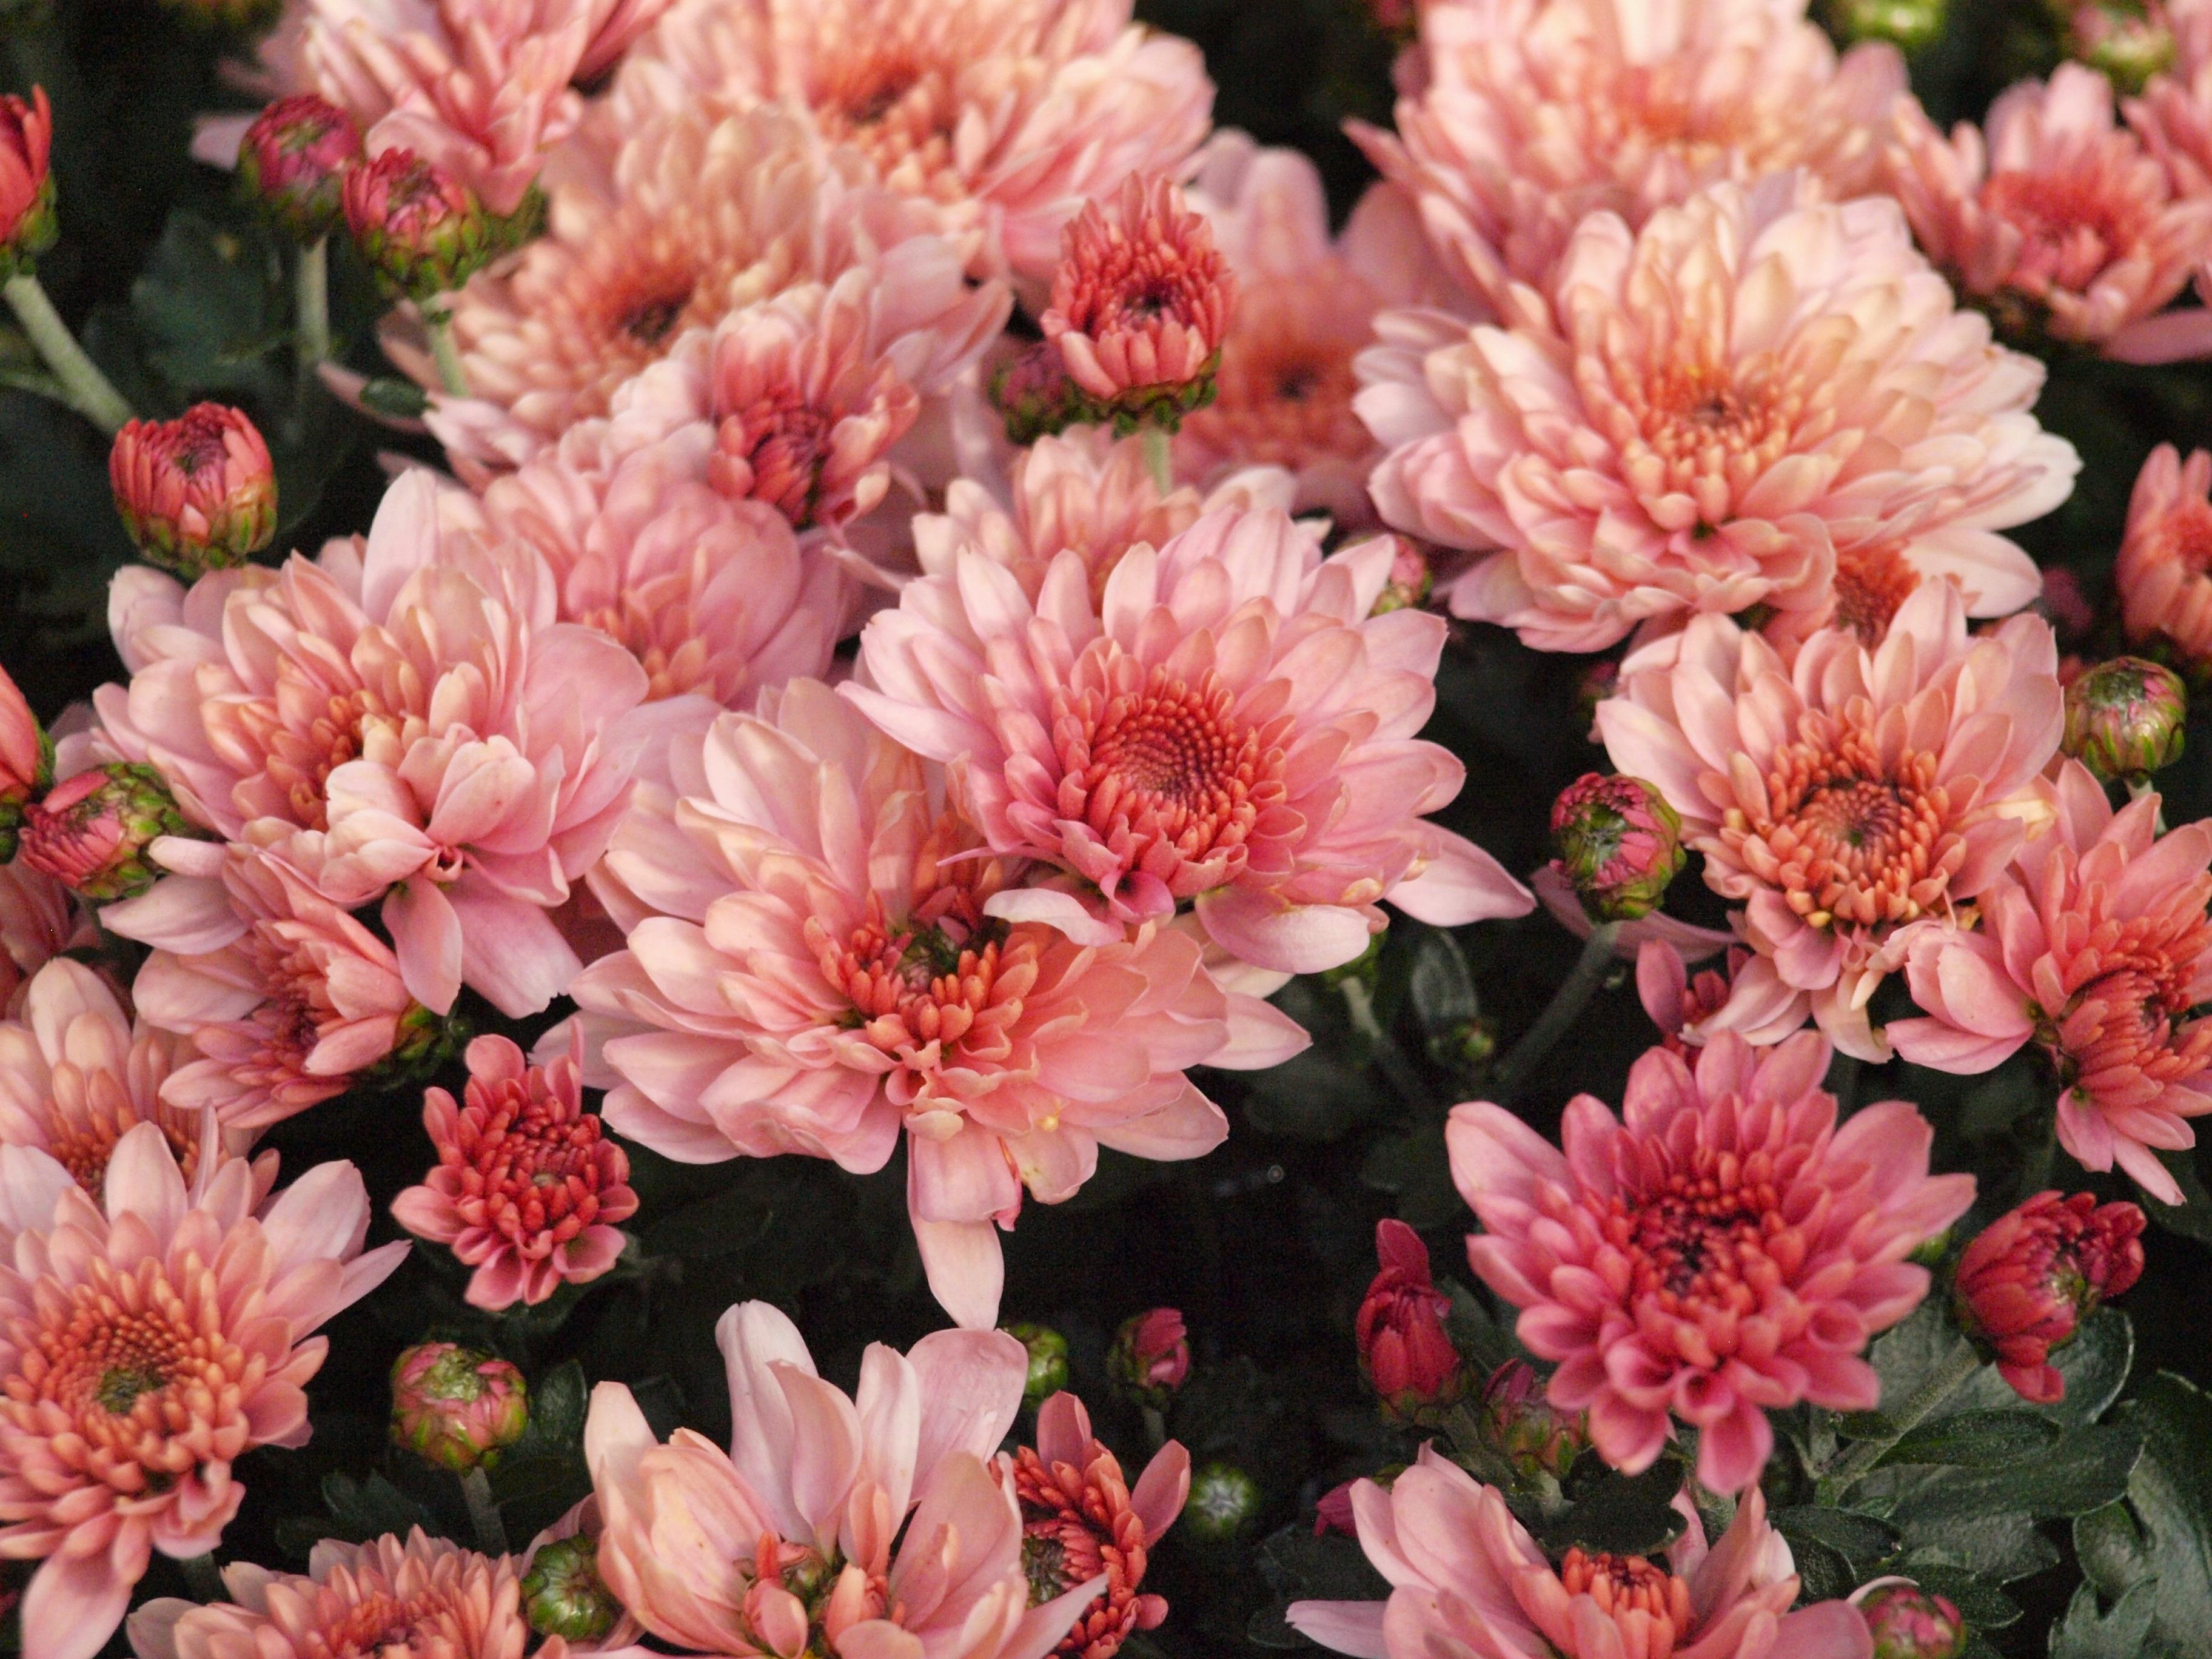 Free Images Blossom Petal Bloom Garden Pink Dahlia Floristry